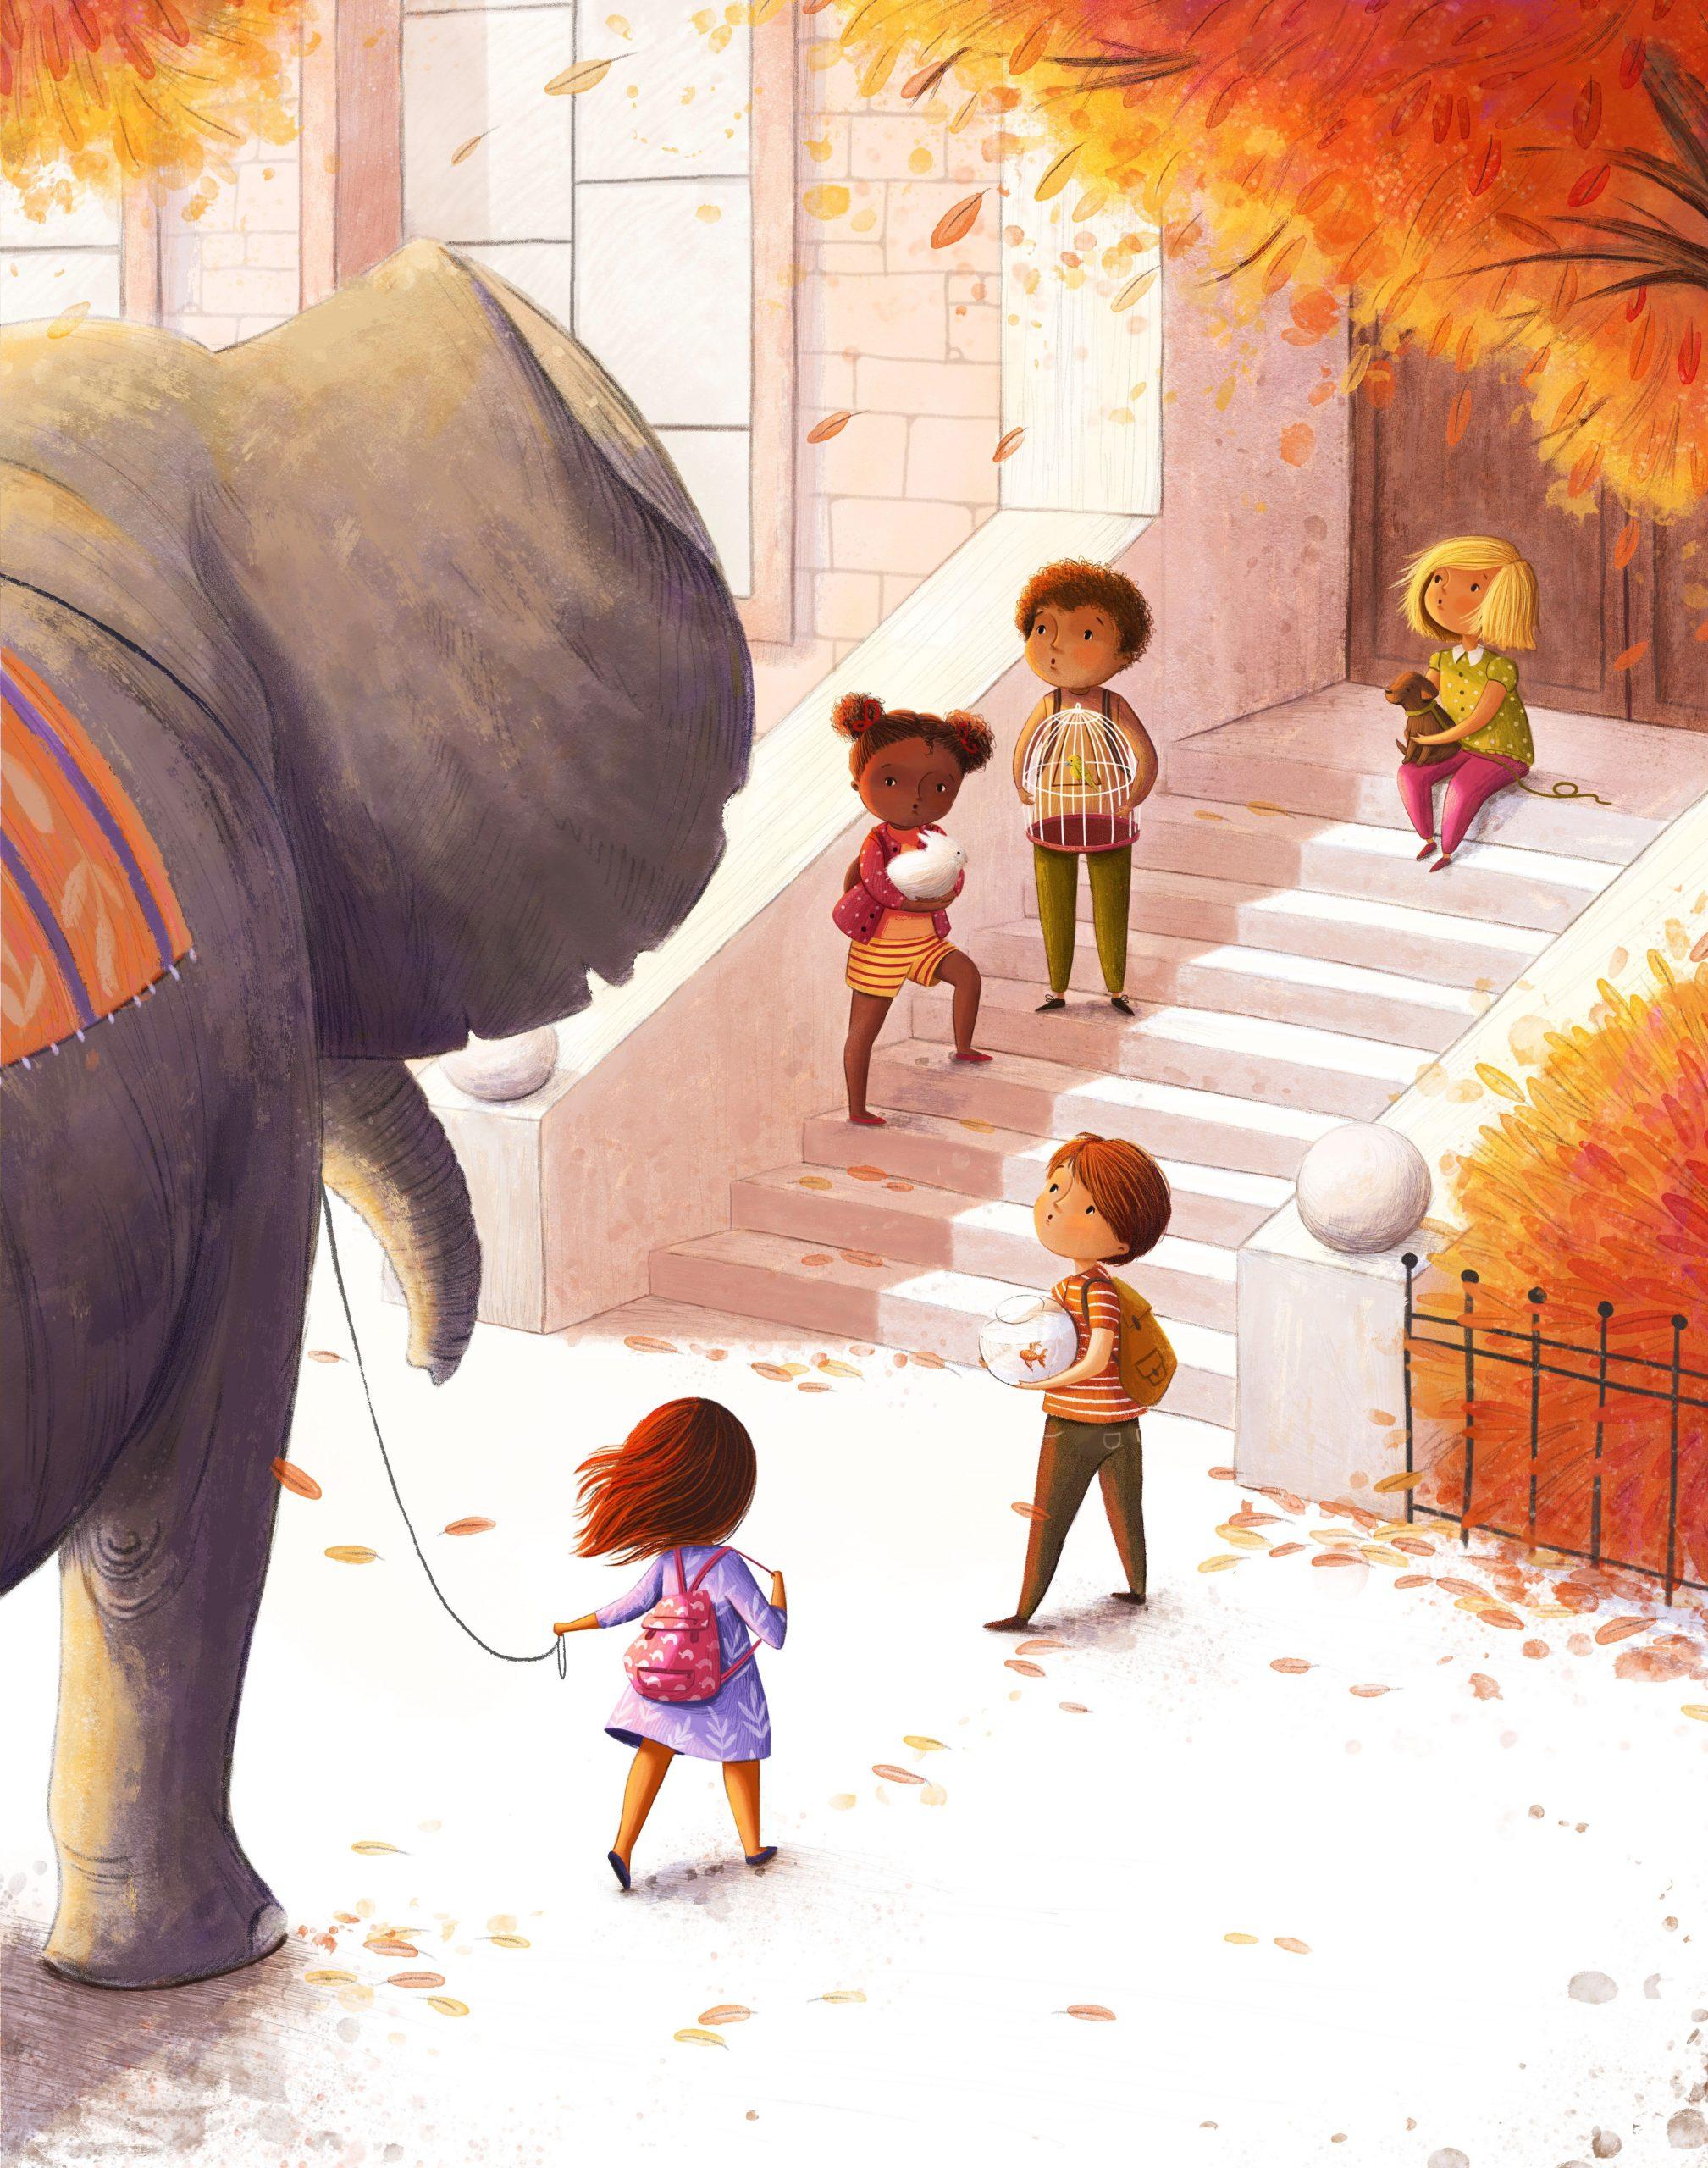 Pin By Lulú On Elefantes<3 In 2020 | Autumn Illustration destiné Lulu Impression